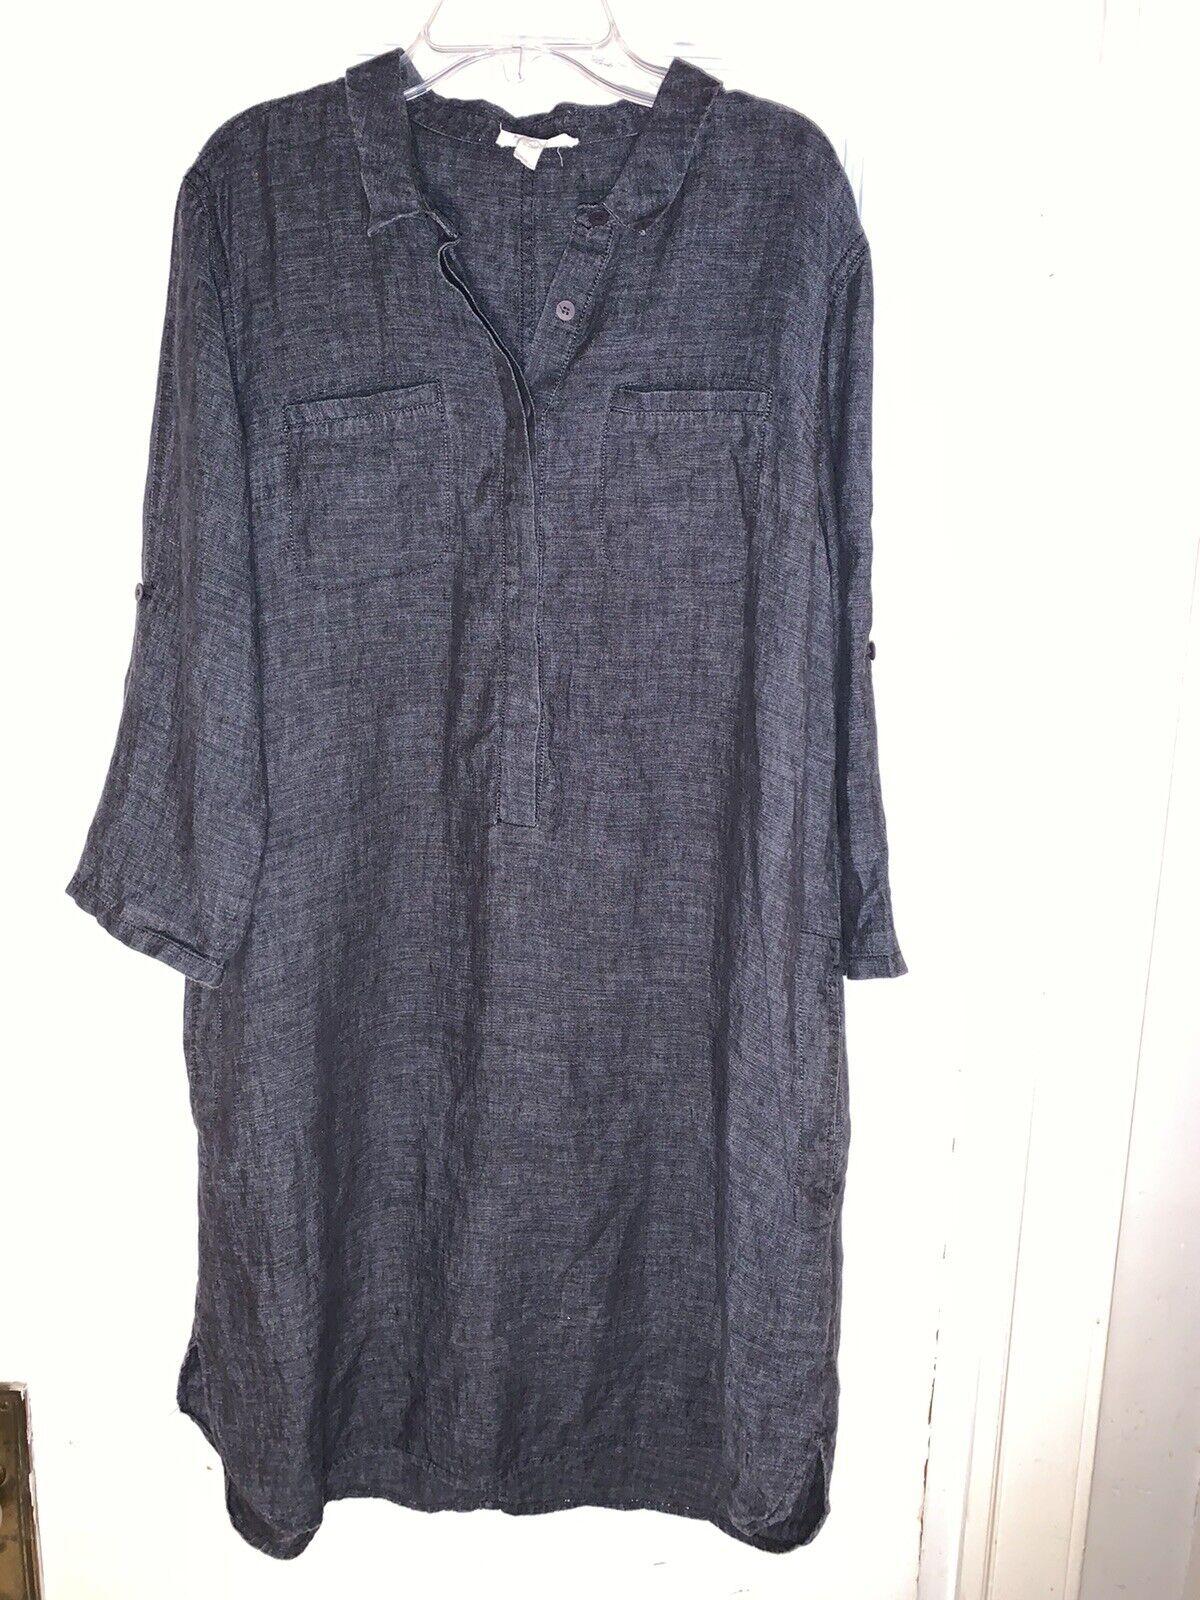 Eileen Fisher Popover Dress Organic Linen Denim Chambray 3/4 sleeve sz S